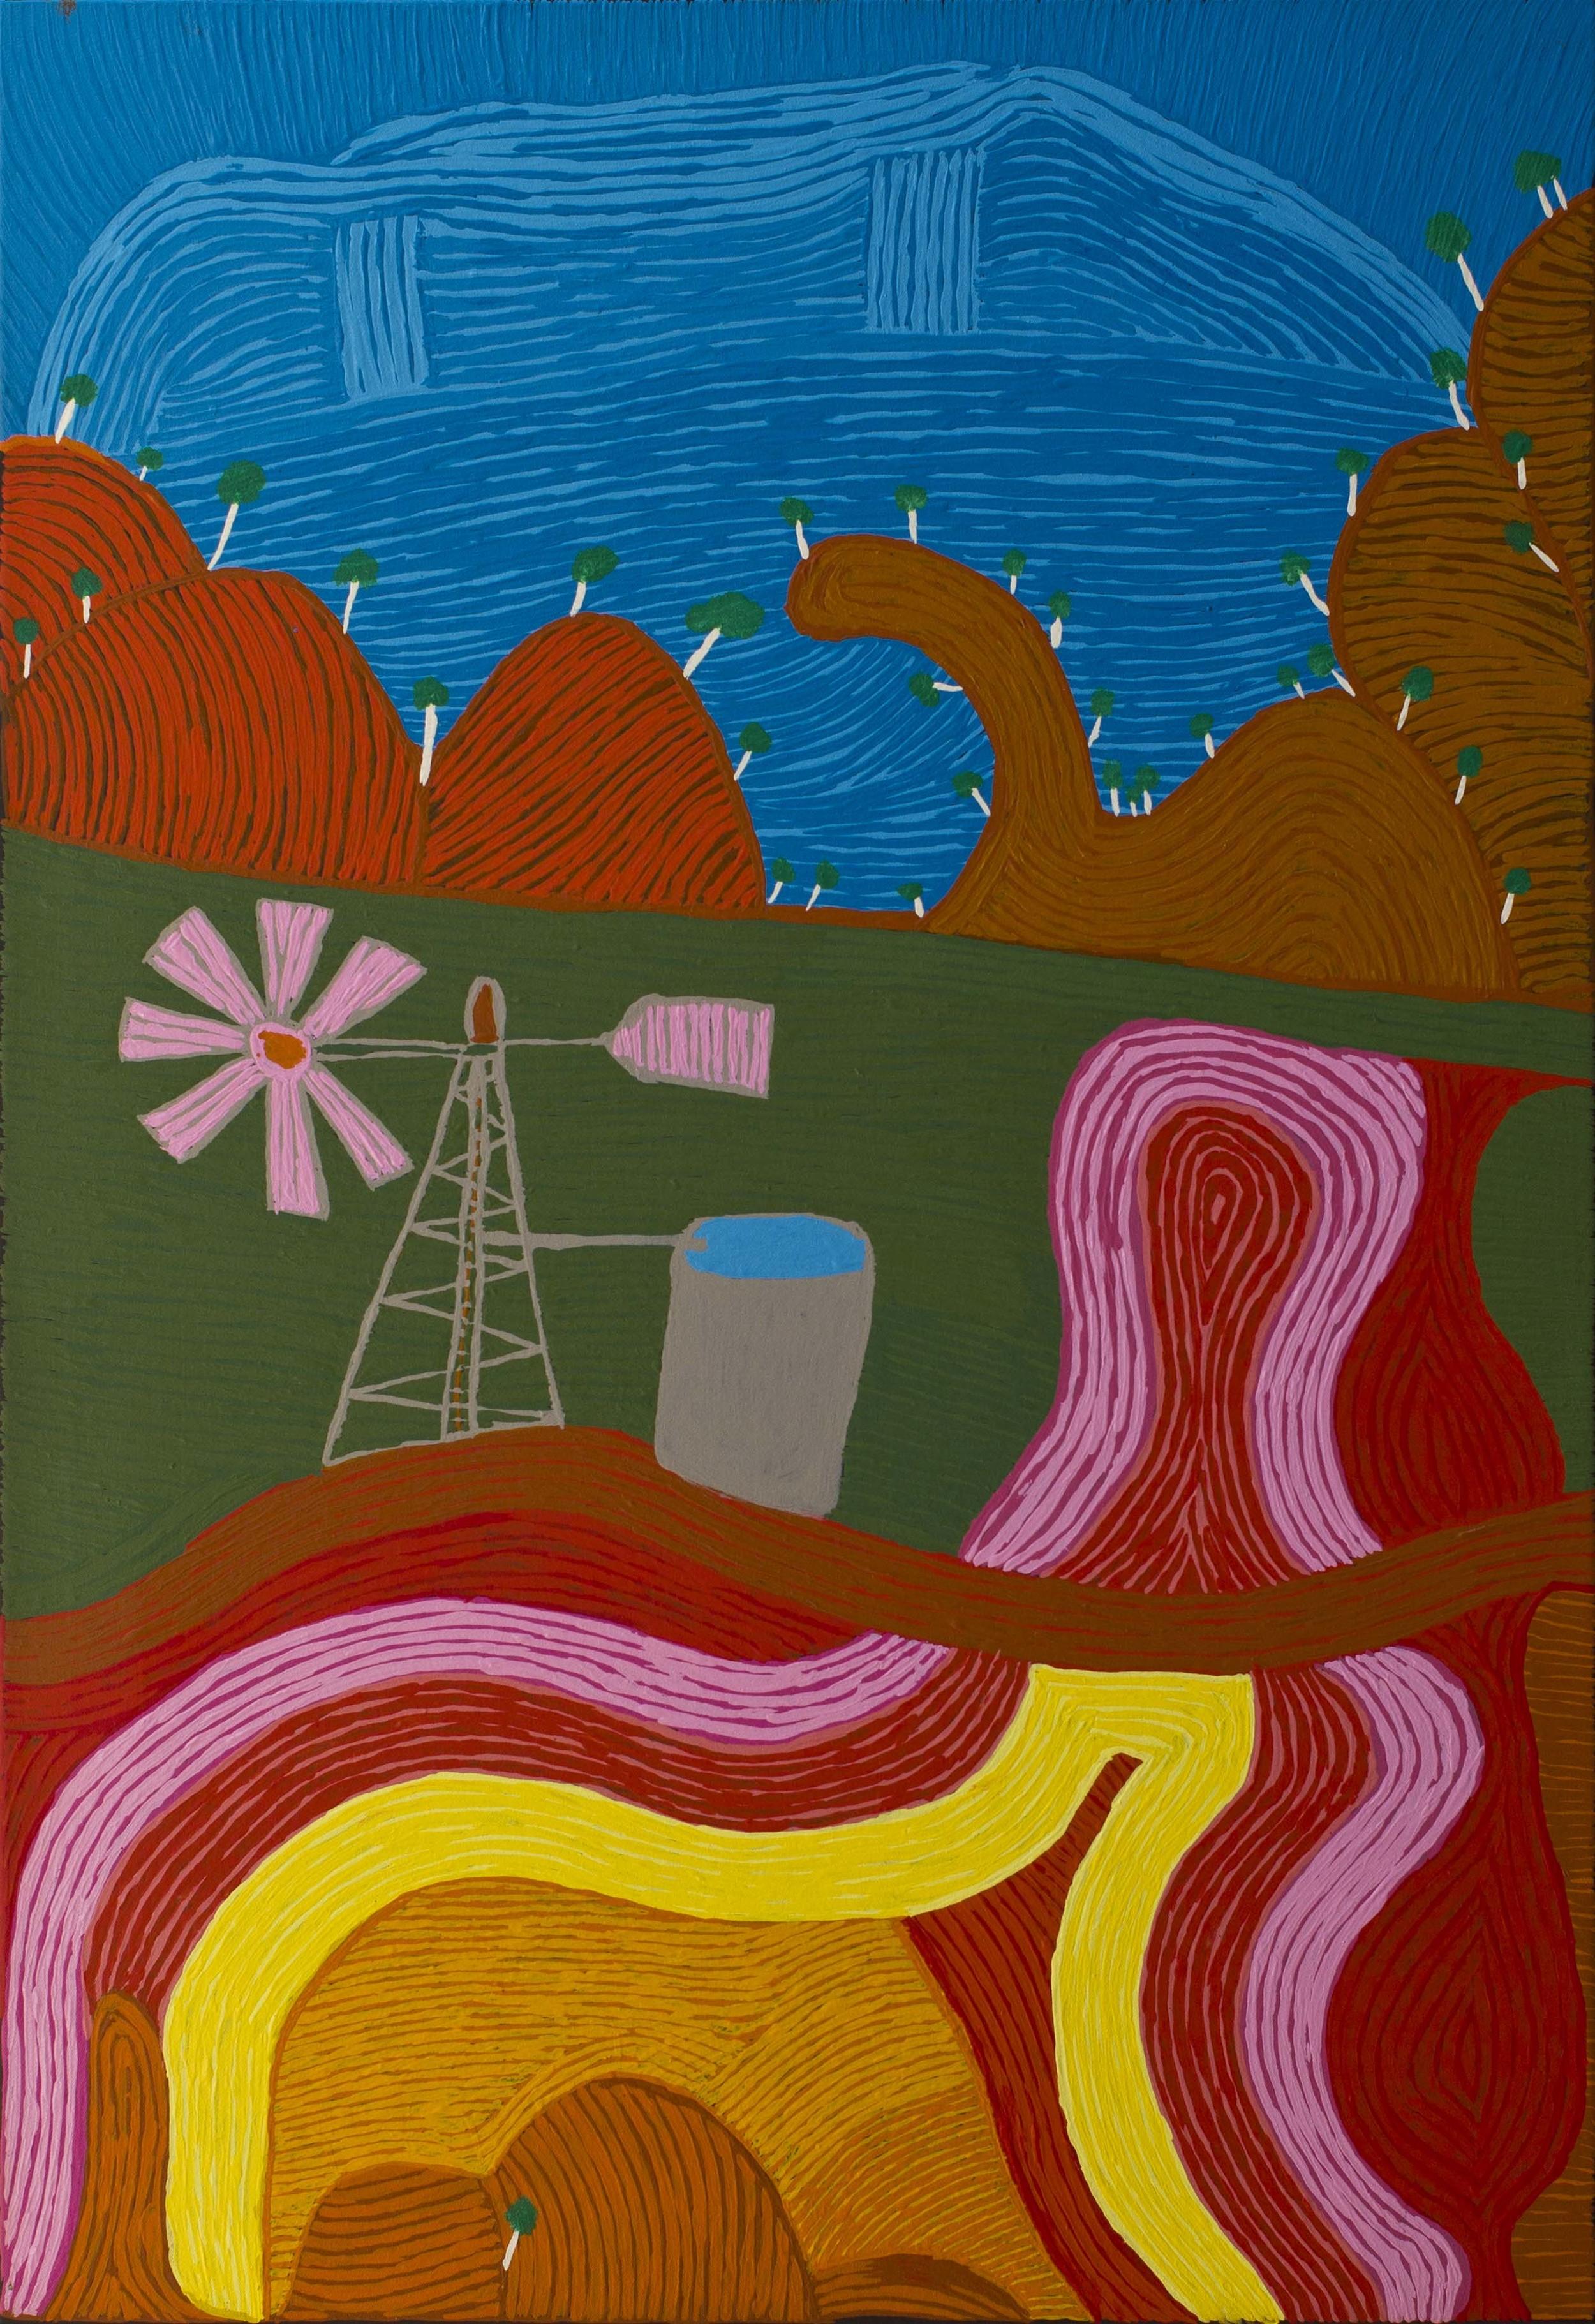 Niningka Munkuri Lewis Ernabella-La 30 x 48 inches (84 x 122 cm) Acrylic on canvas Ernabella Arts Catalog #596-12   EMAIL INQUIRY